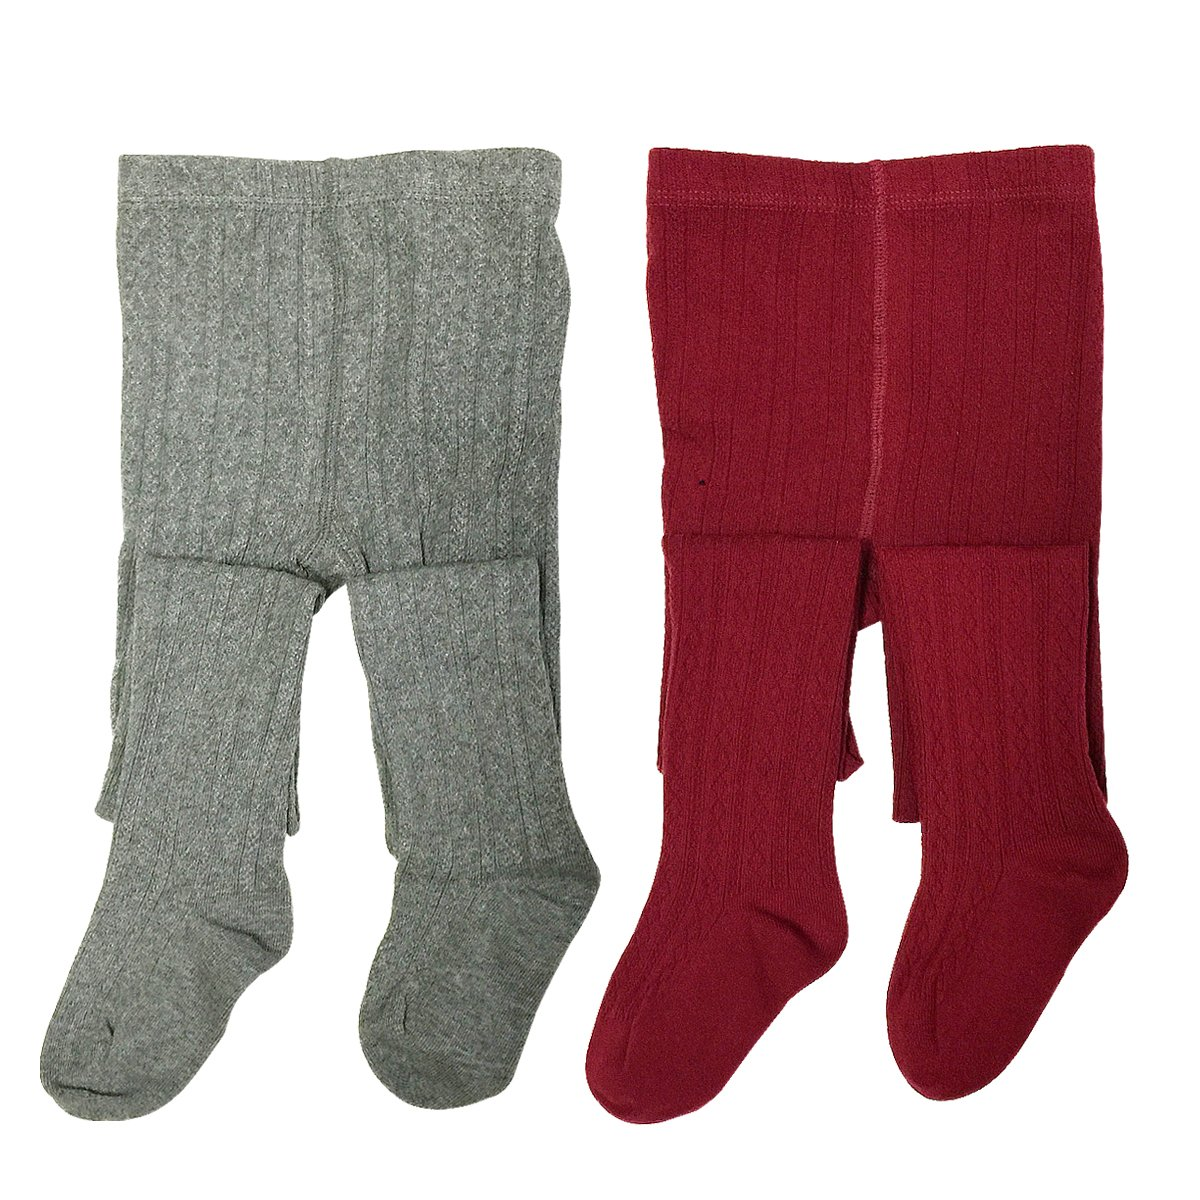 Bowbear 2-Pair Girls Fancy Knit Cotton Tights